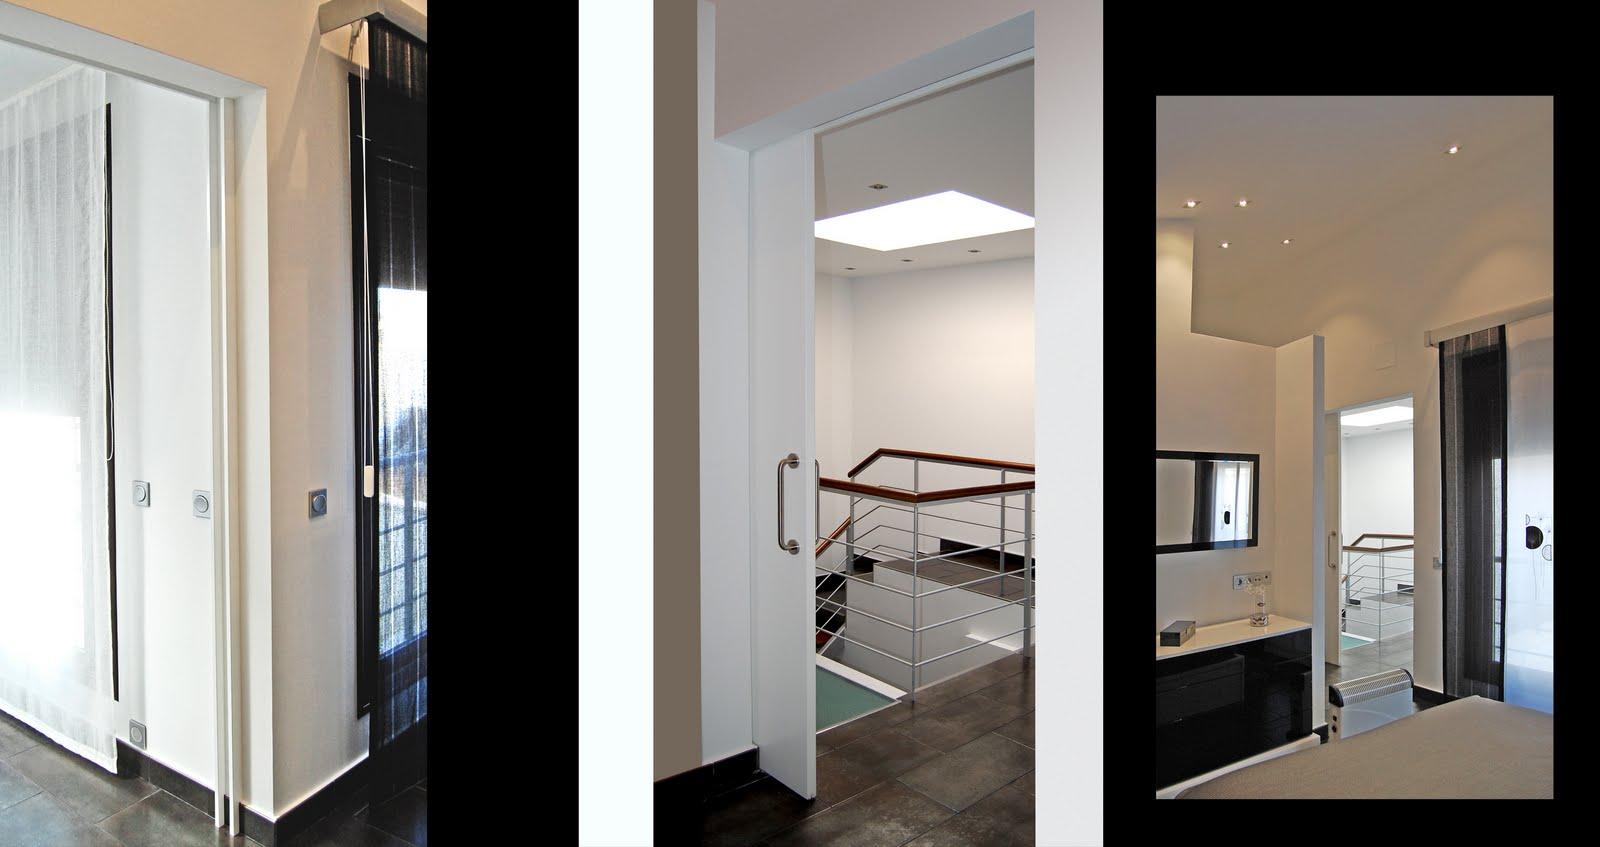 Via3arquitectura for Ideas de iluminacion